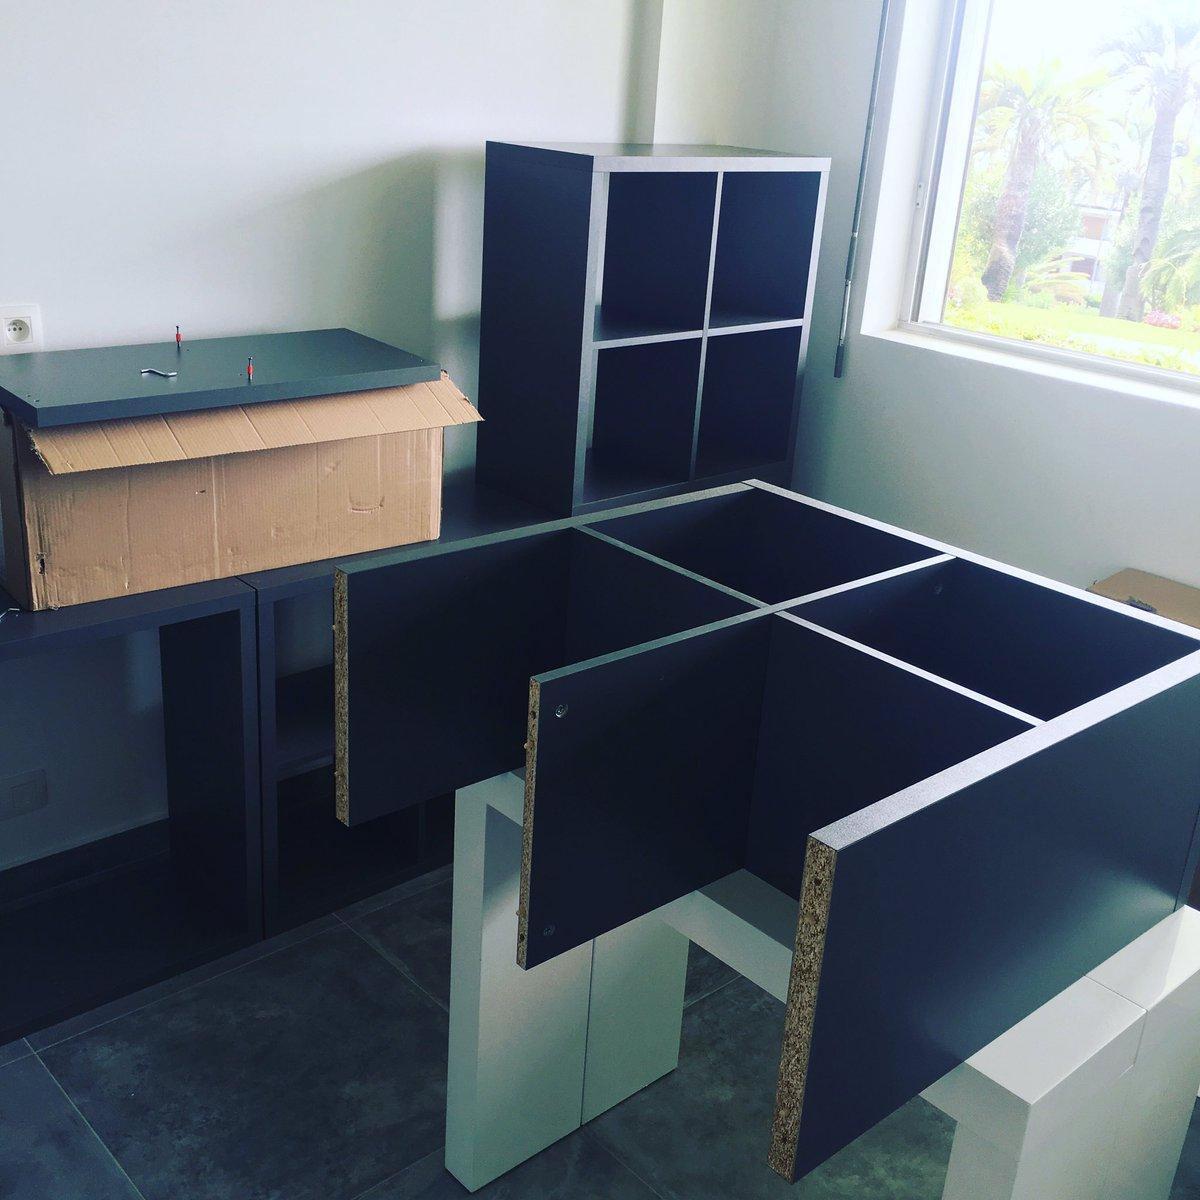 New appartment, new view, new furnitures !  Thks @FrankPILA &amp; family ;-) !  #CoteDAzurNow #CoteDAzurFrance #FrenchRiviera #FrenchMerveilles <br>http://pic.twitter.com/zywlkH9jJj